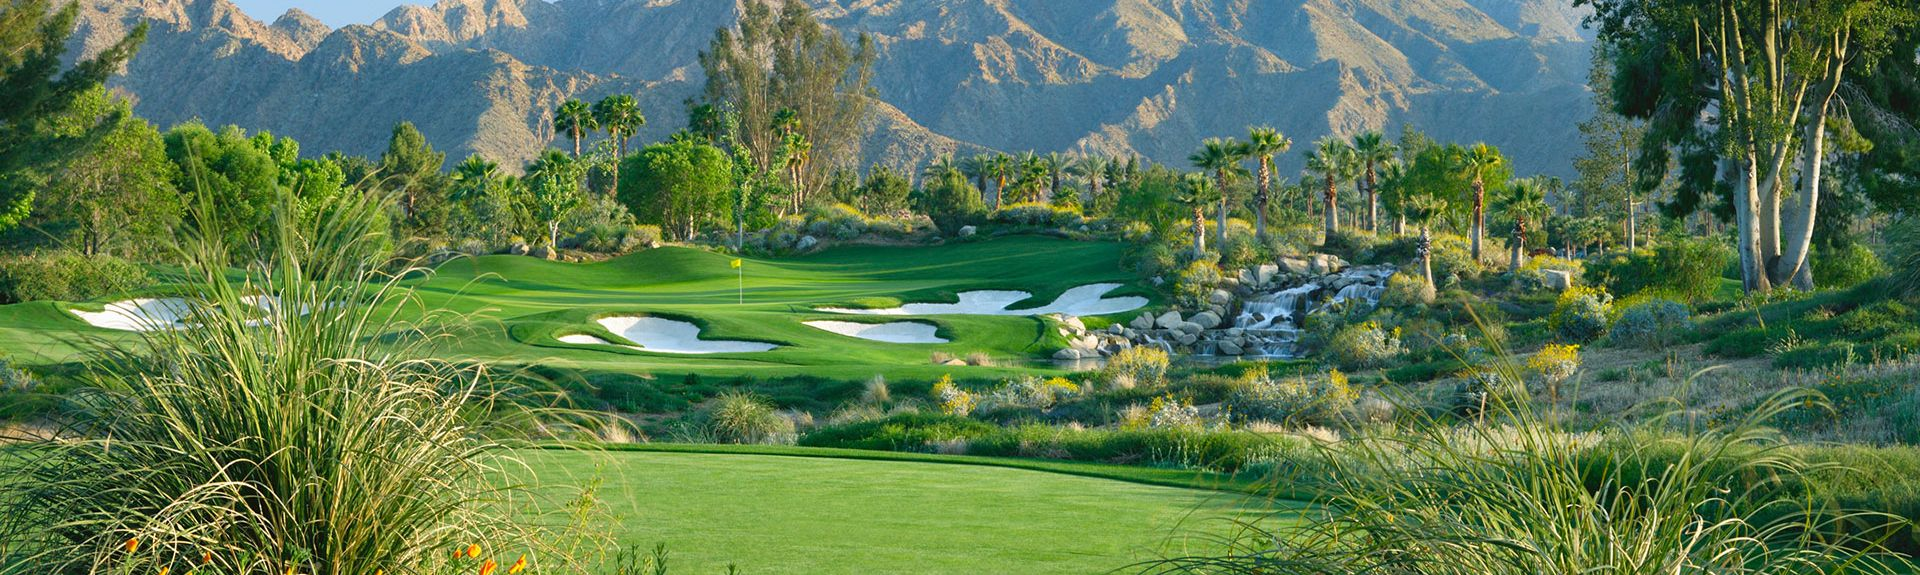 Palm Canyon, Palm Springs, CA, USA